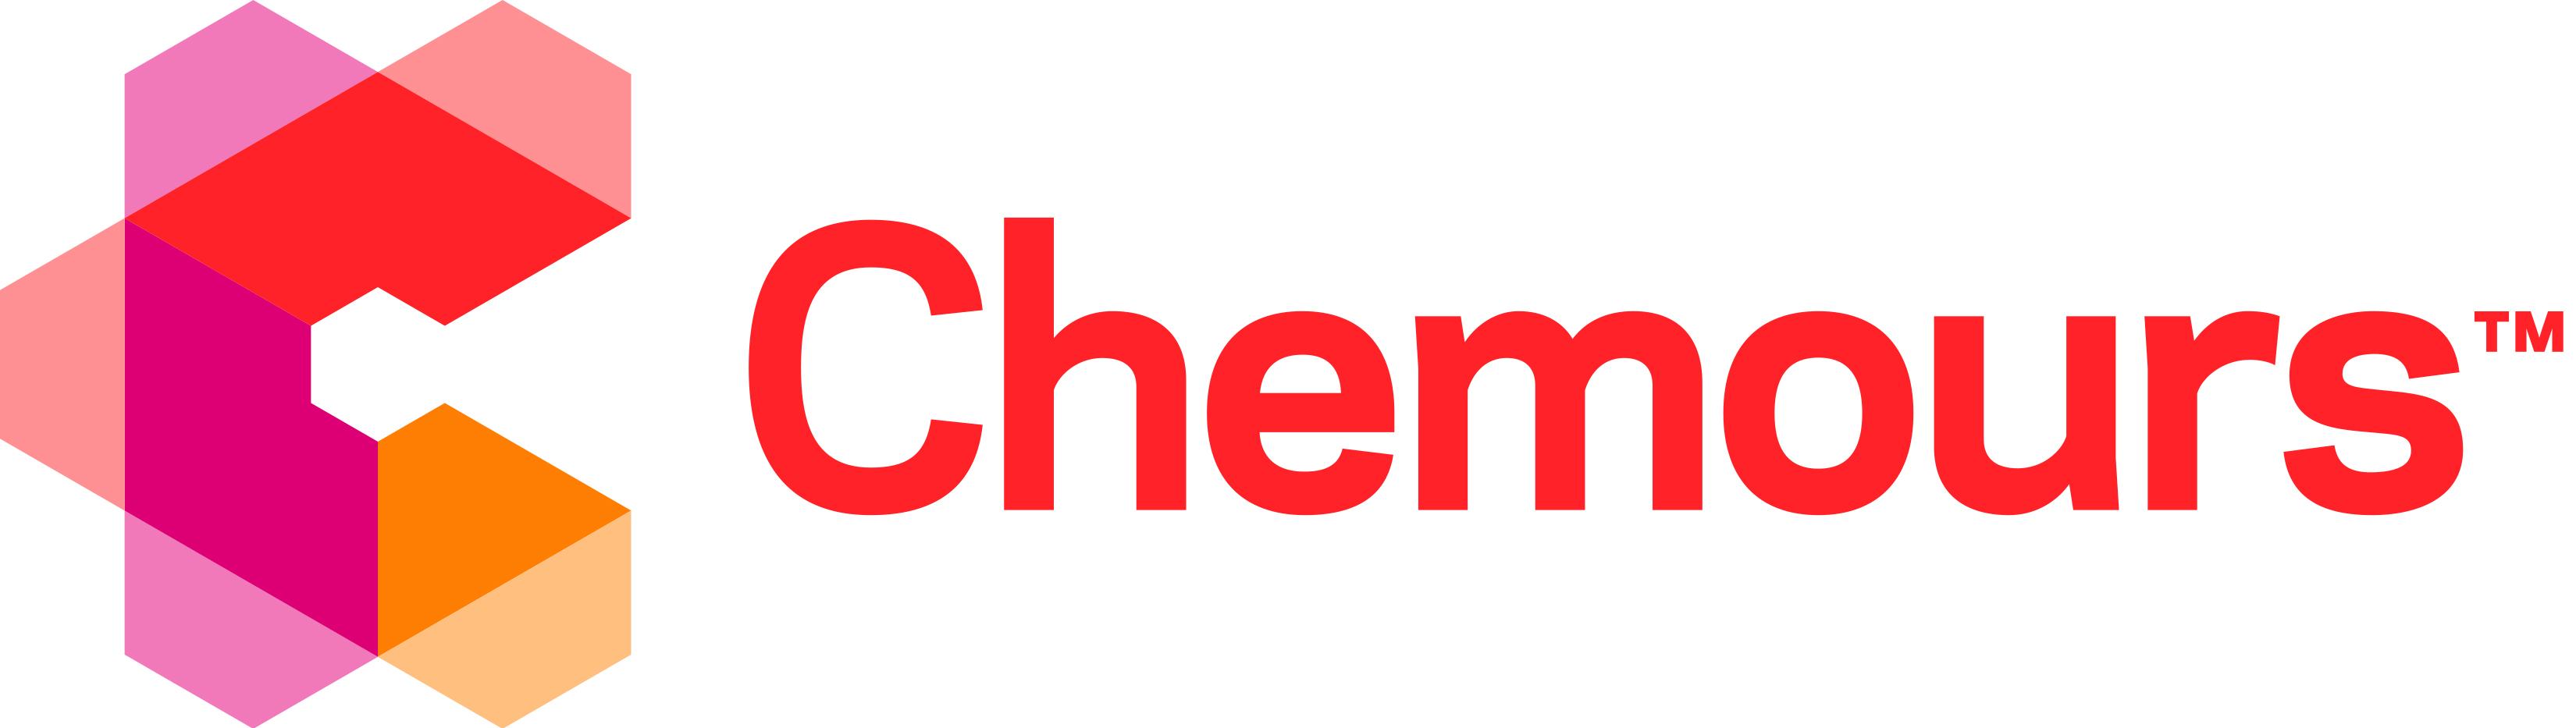 Organization: Chemours